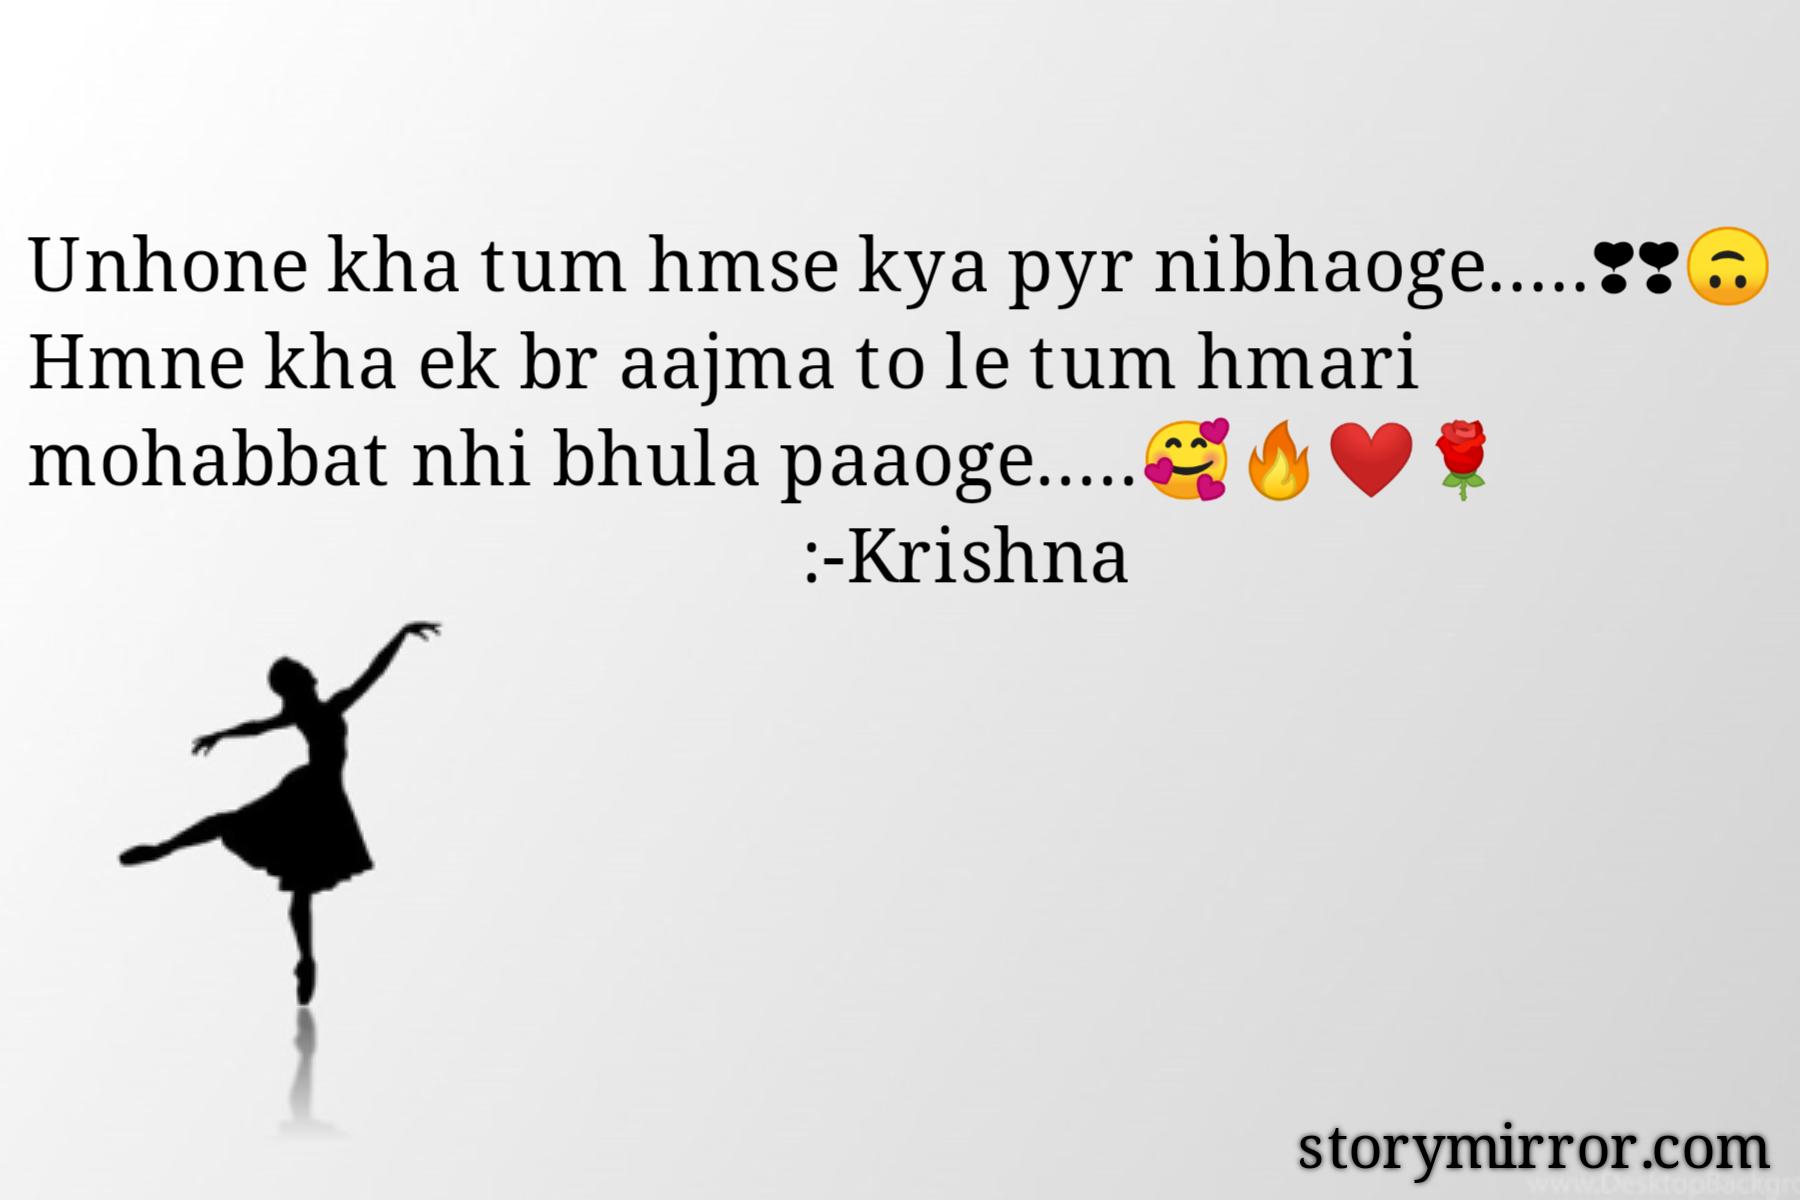 Unhone kha tum hmse kya pyr nibhaoge.....❣❣🙃 Hmne kha ek br aajma to le tum hmari mohabbat nhi bhula paaoge.....🥰🔥❤🌹                                             :-Krishna